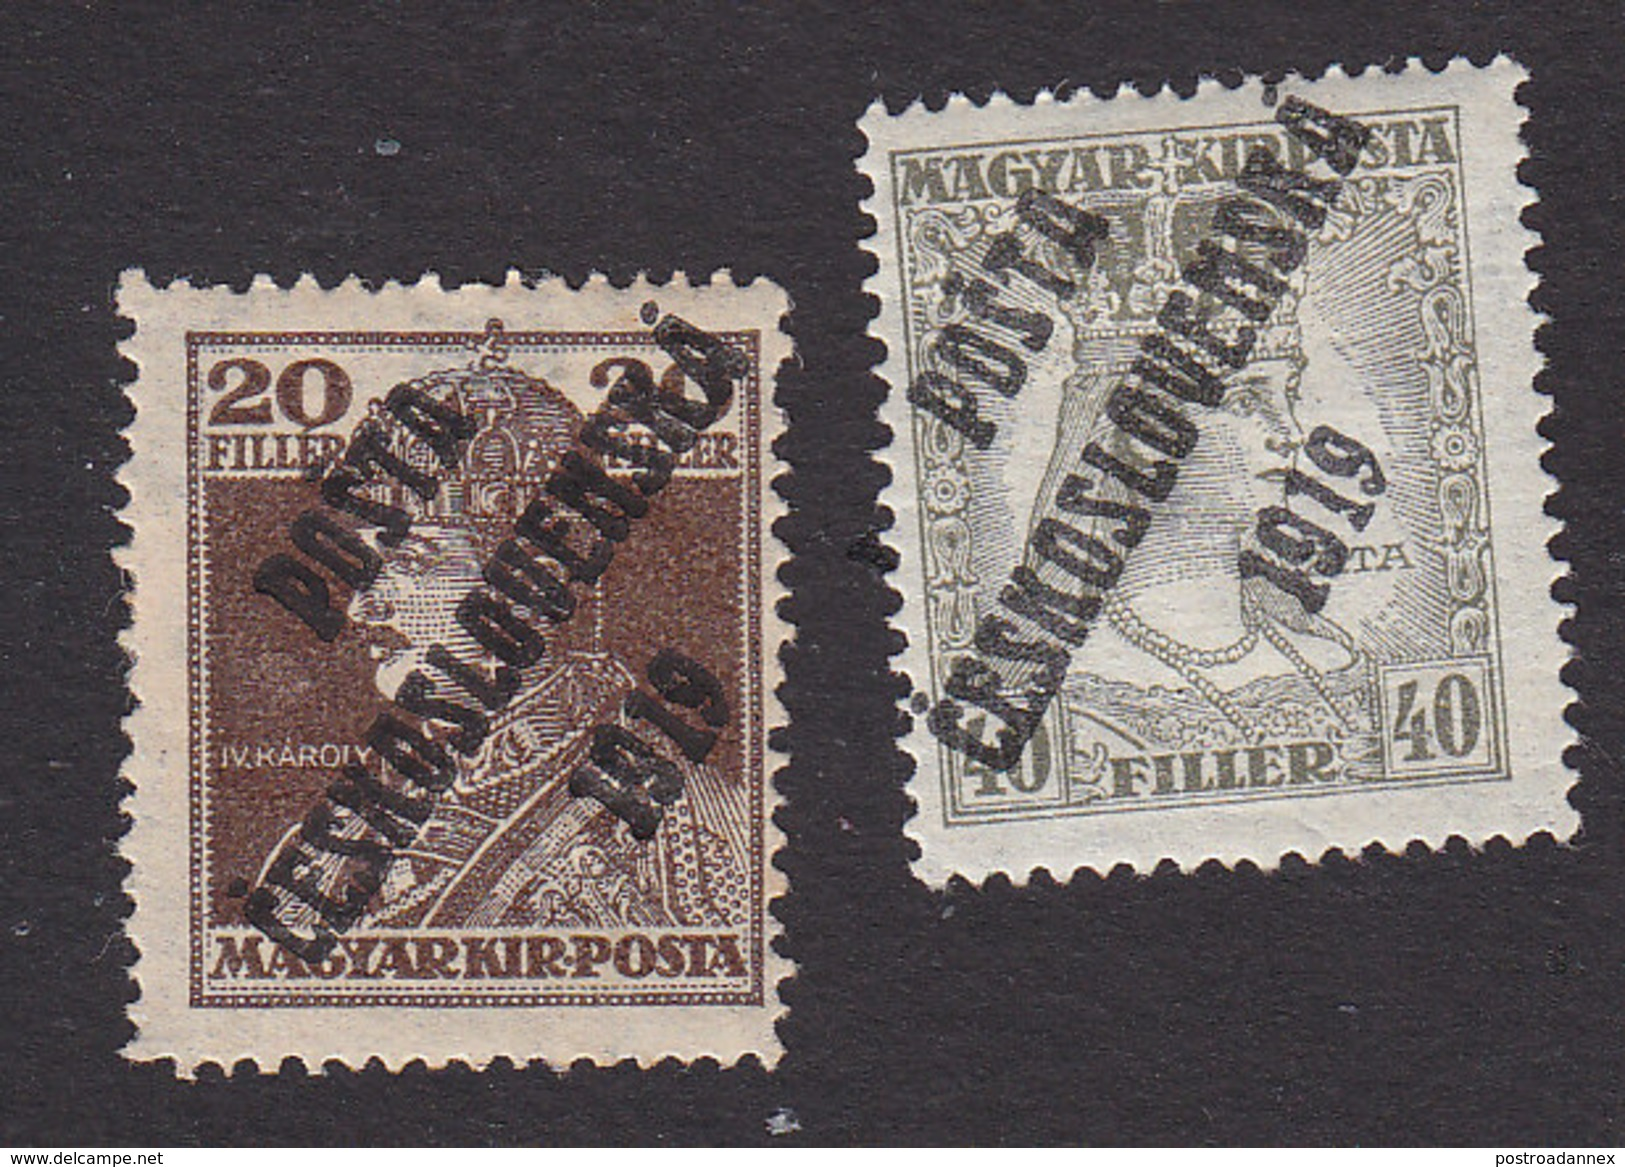 Czechoslovakia, Scott #B92, B94, Mint Hinged, Hungarian Stamps Overprinted, Issued 1919 - Czechoslovakia